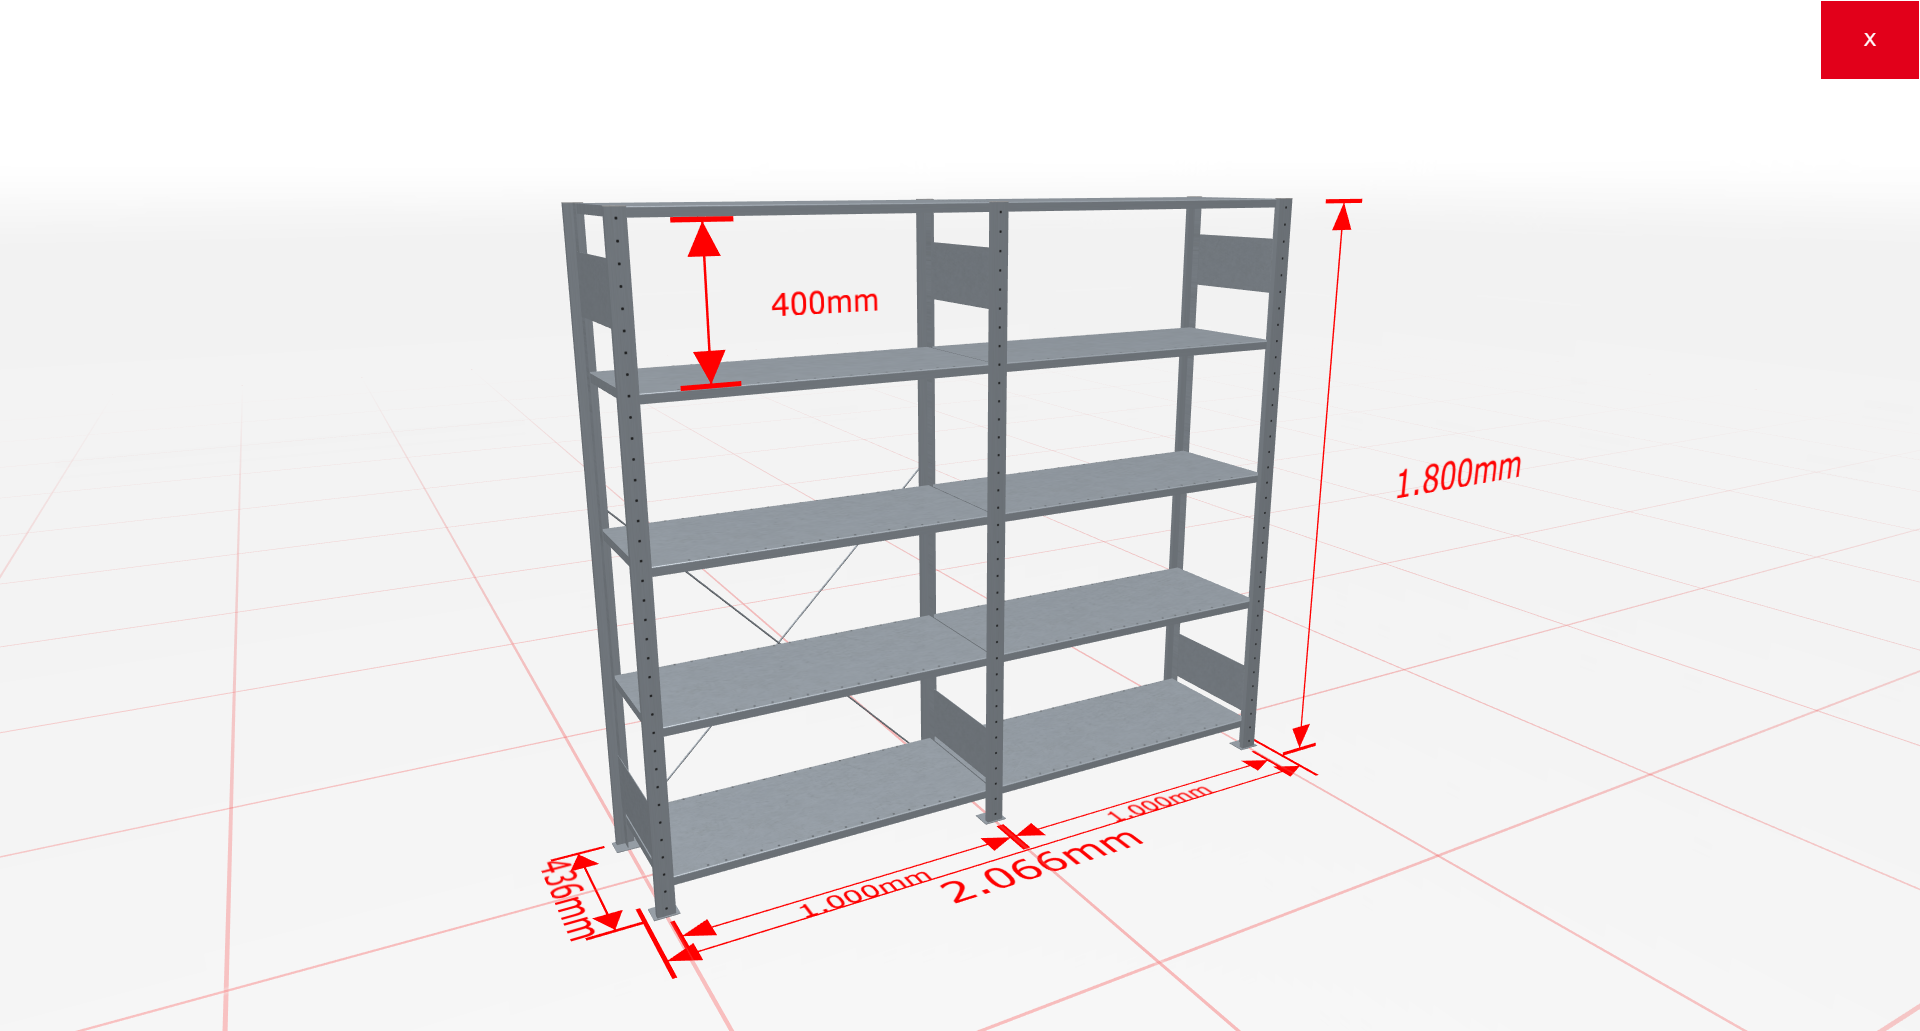 Fachbodenregal Komplettregal 1800x2066x400 mm (HxBxT) SCHULTE Lagertechnik verzinkt 5 Ebenen  150 kg je Boden